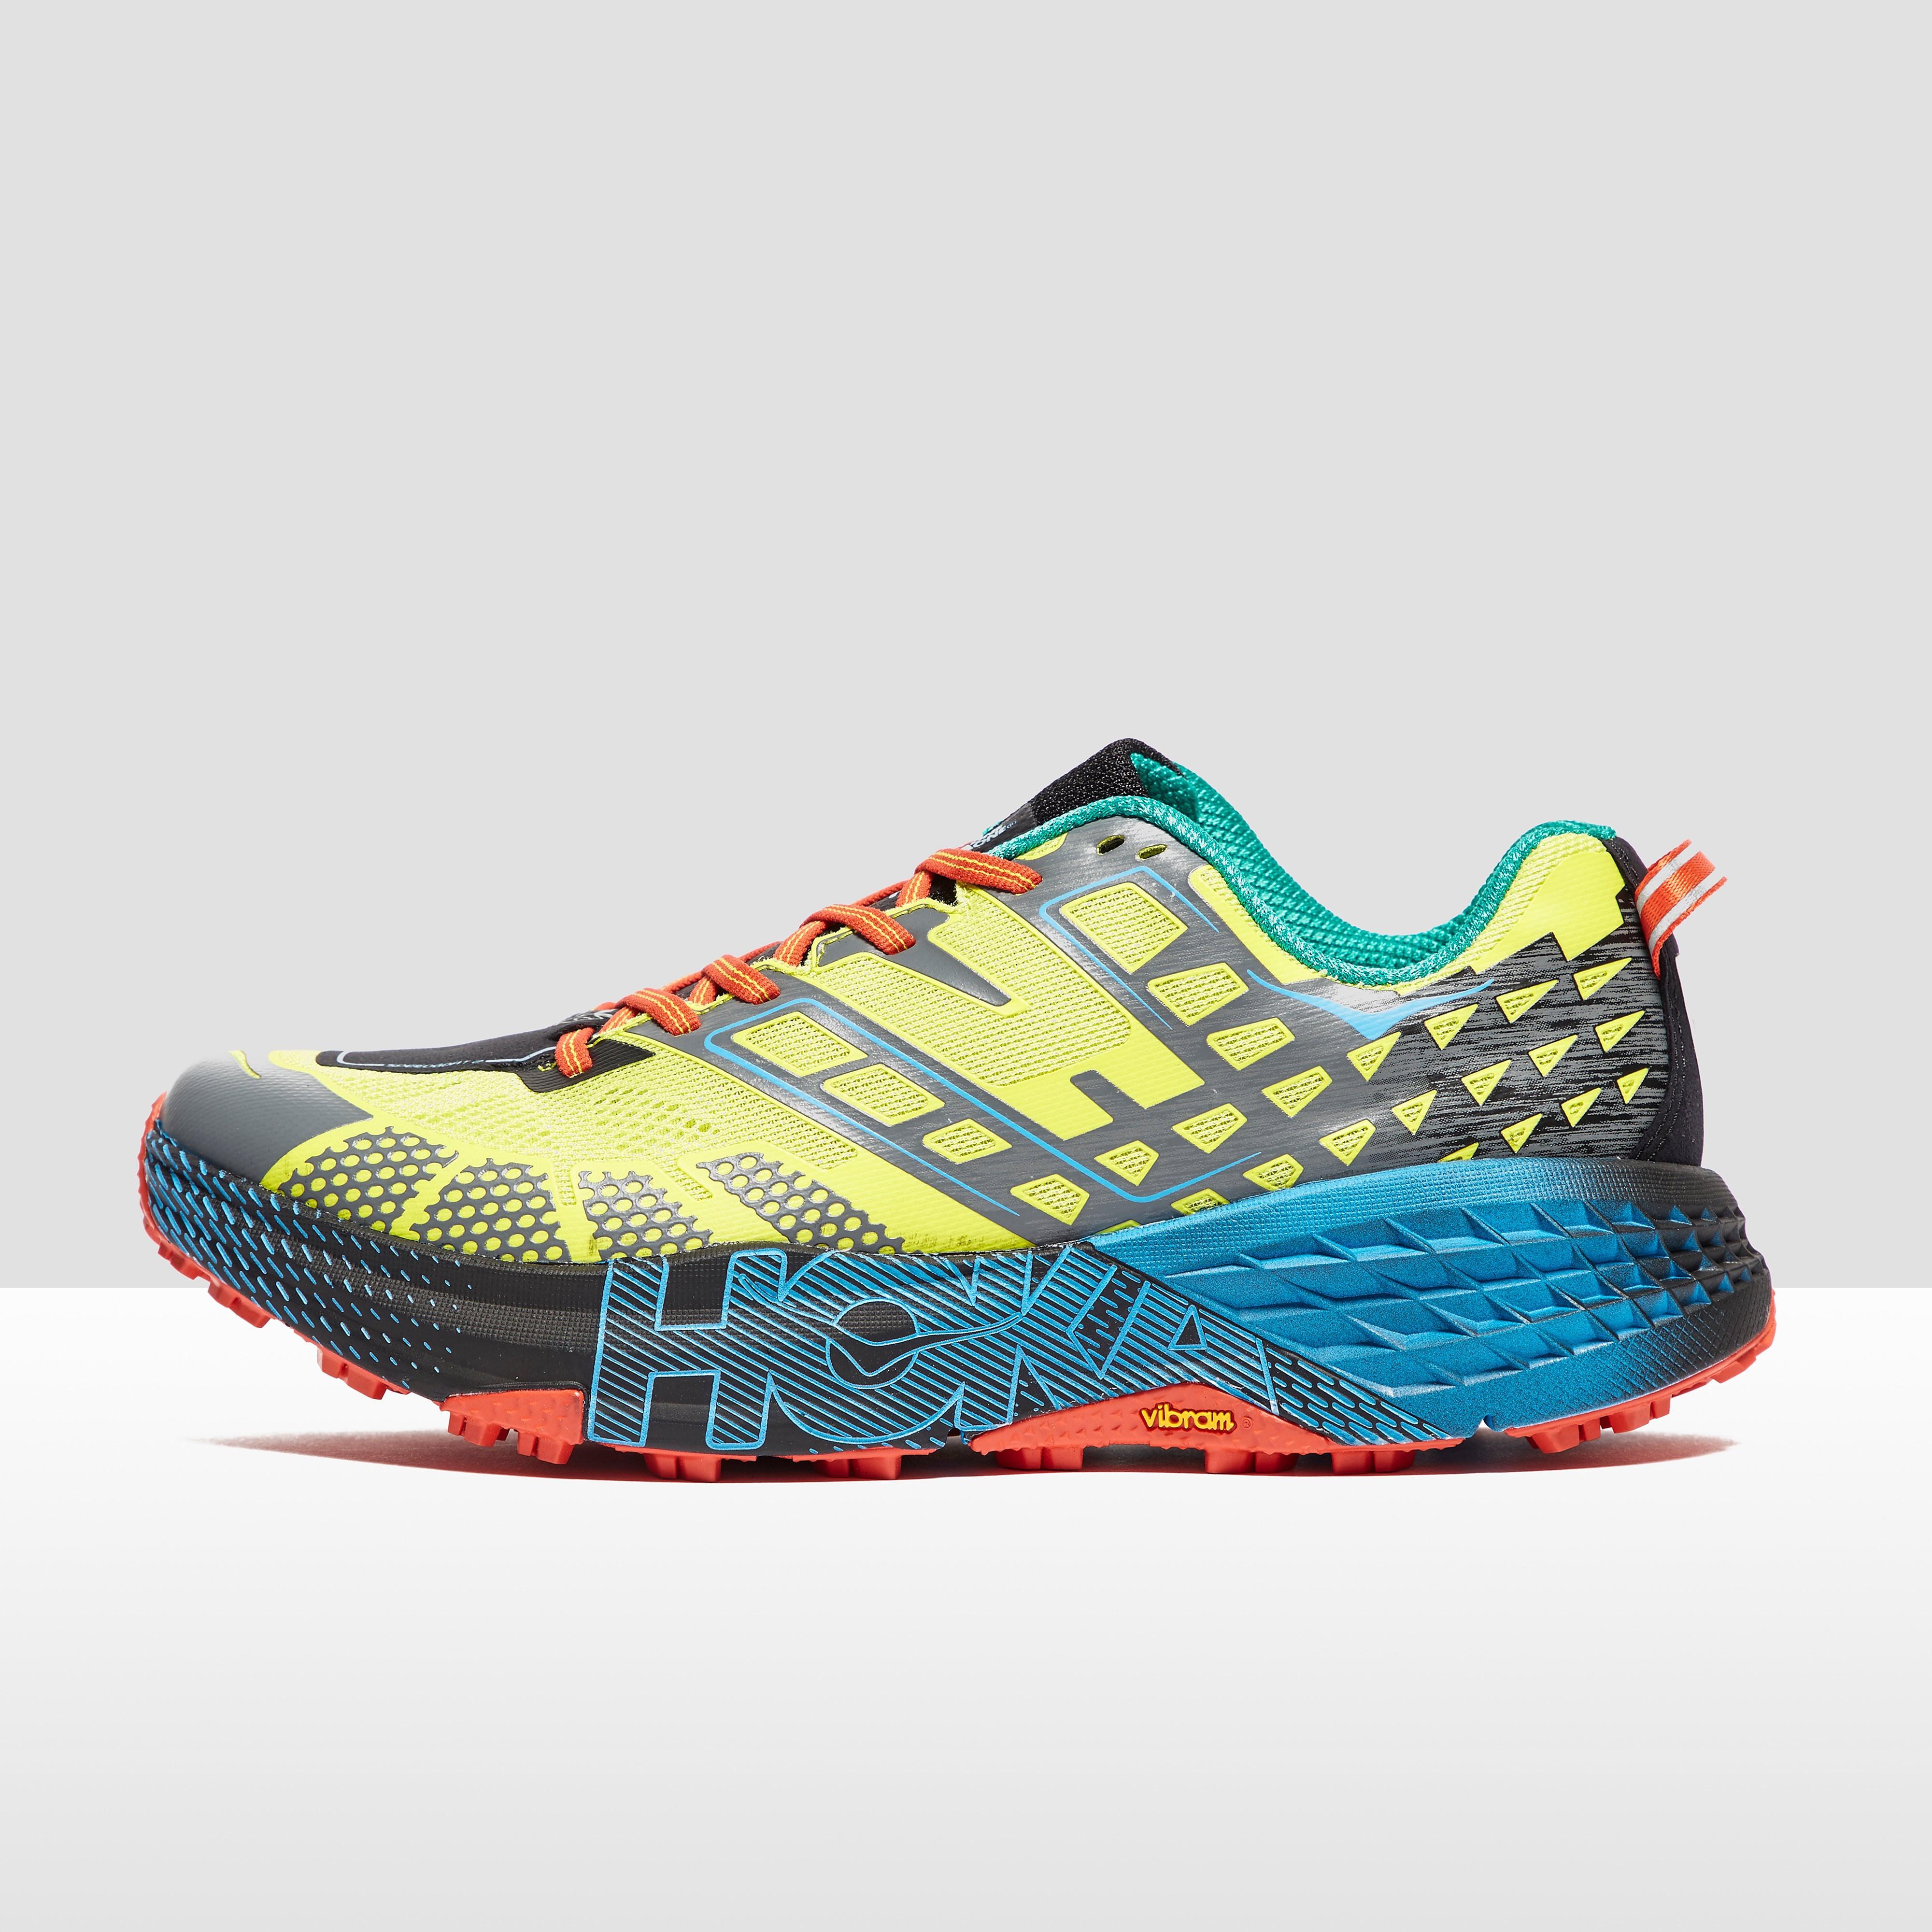 Hoka One One Speedgoat 2 Men's Trail Running Shoes